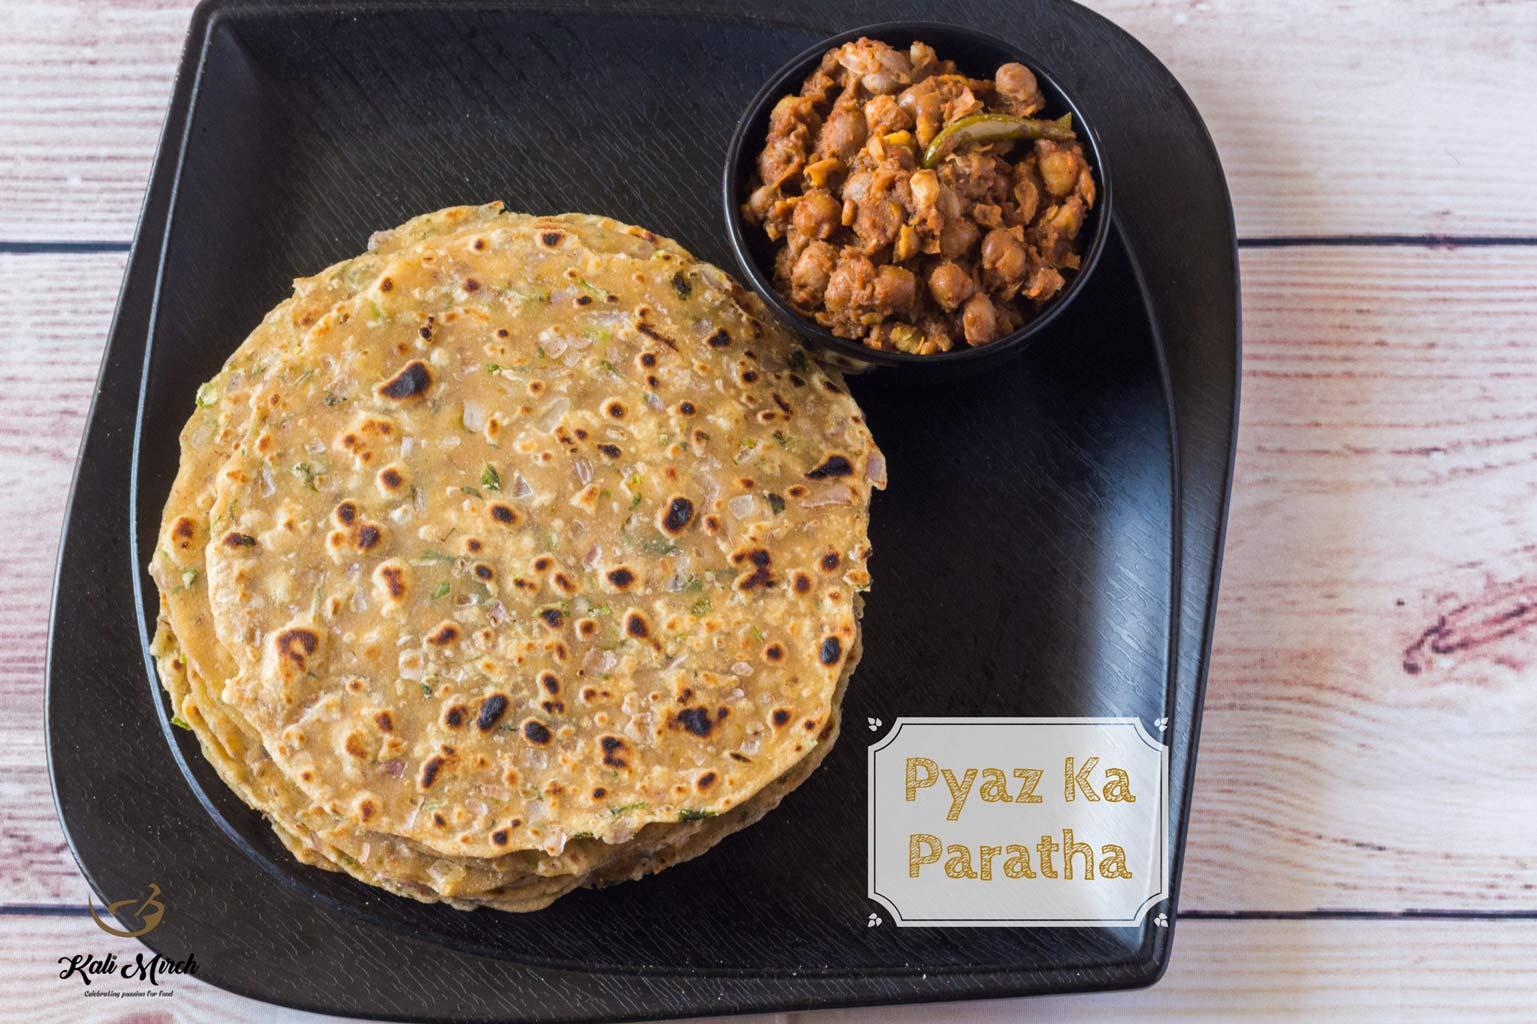 Pyaaz Ka Paratha